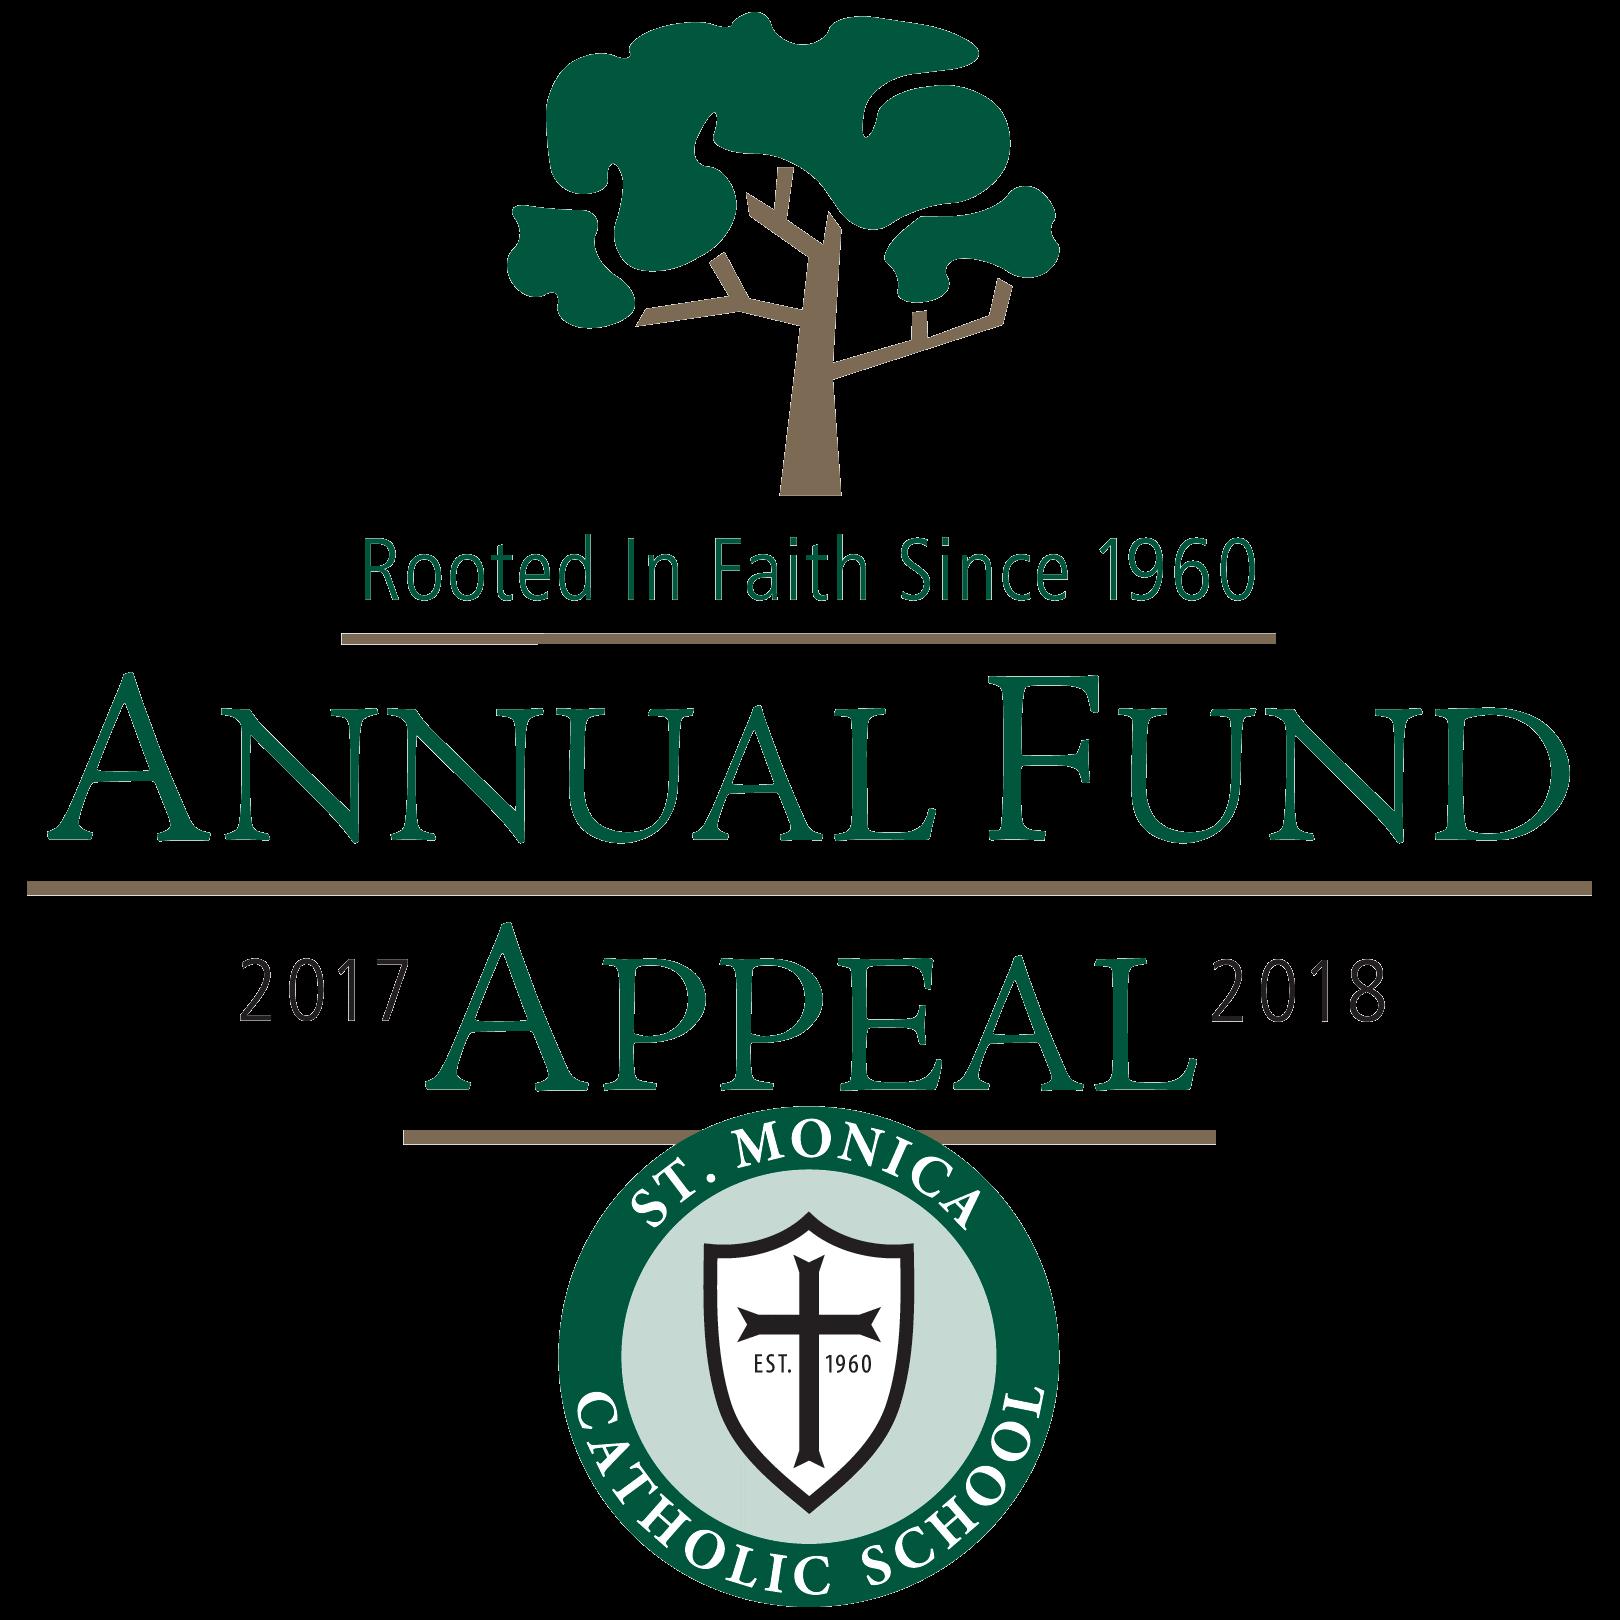 Community clipart parishioner. Annual fund st monica